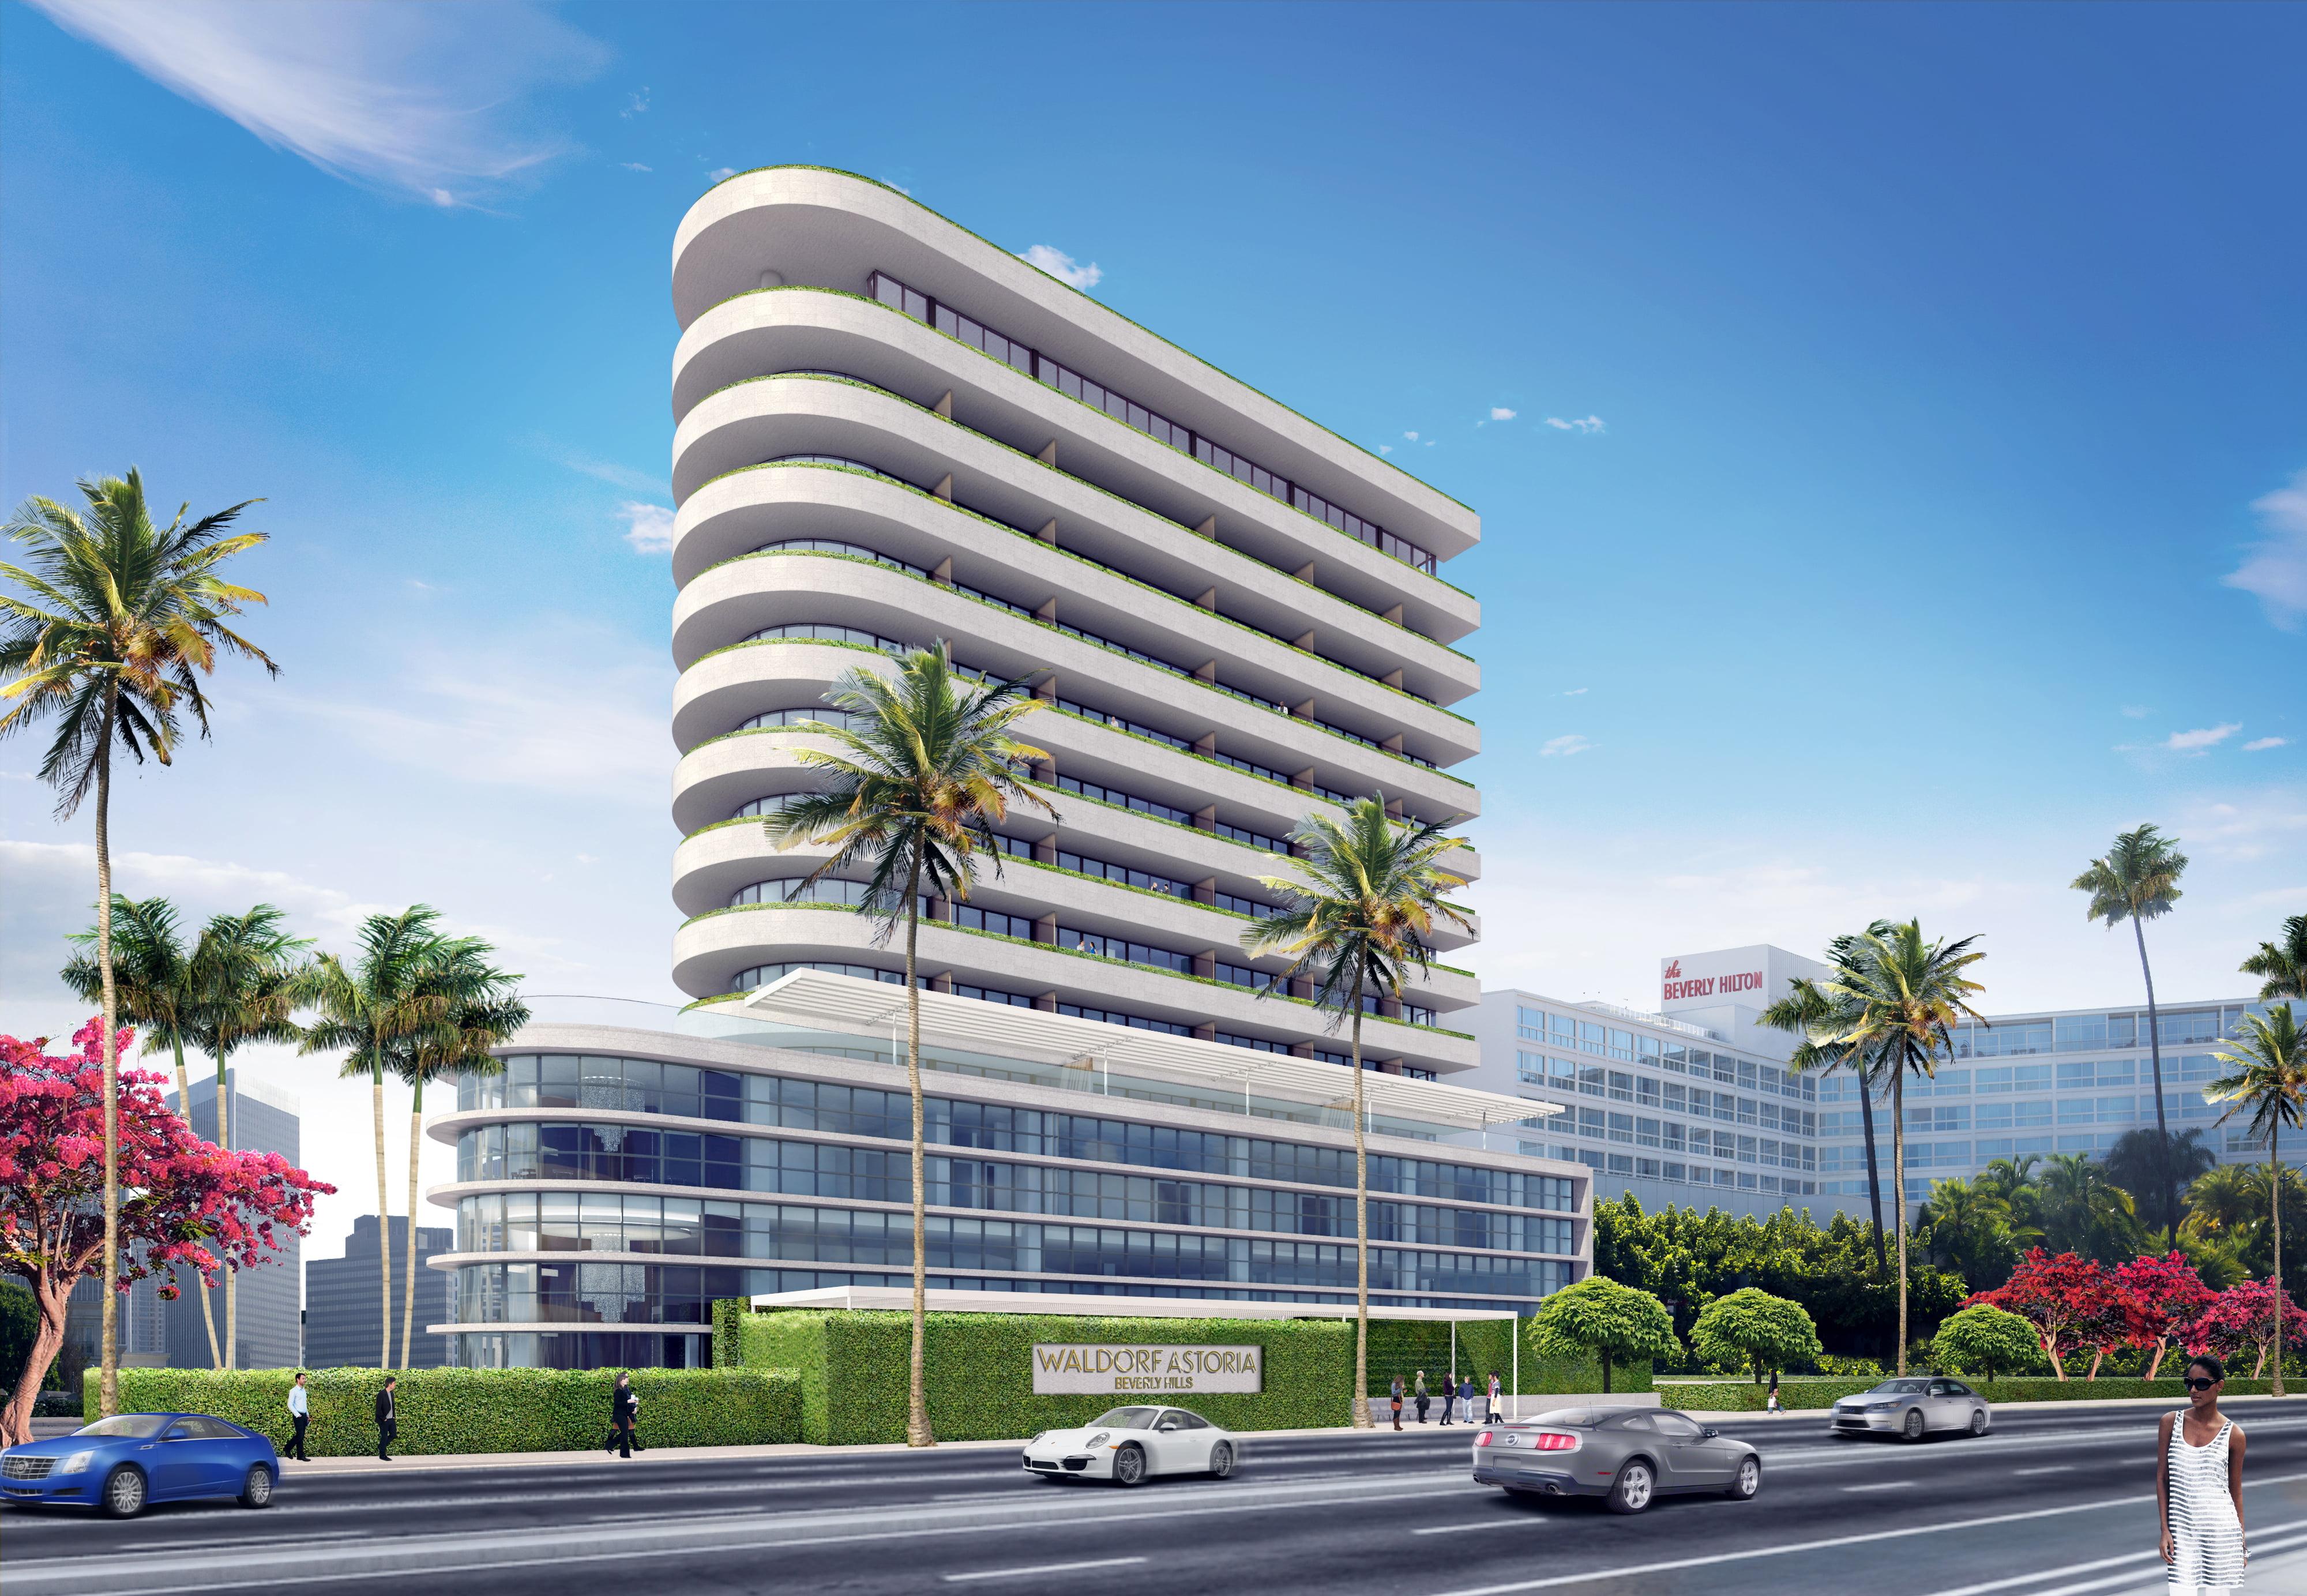 Waldorf Astoria Beverly Hills Exterior Rendering 21786442458 O E International Hotel Design